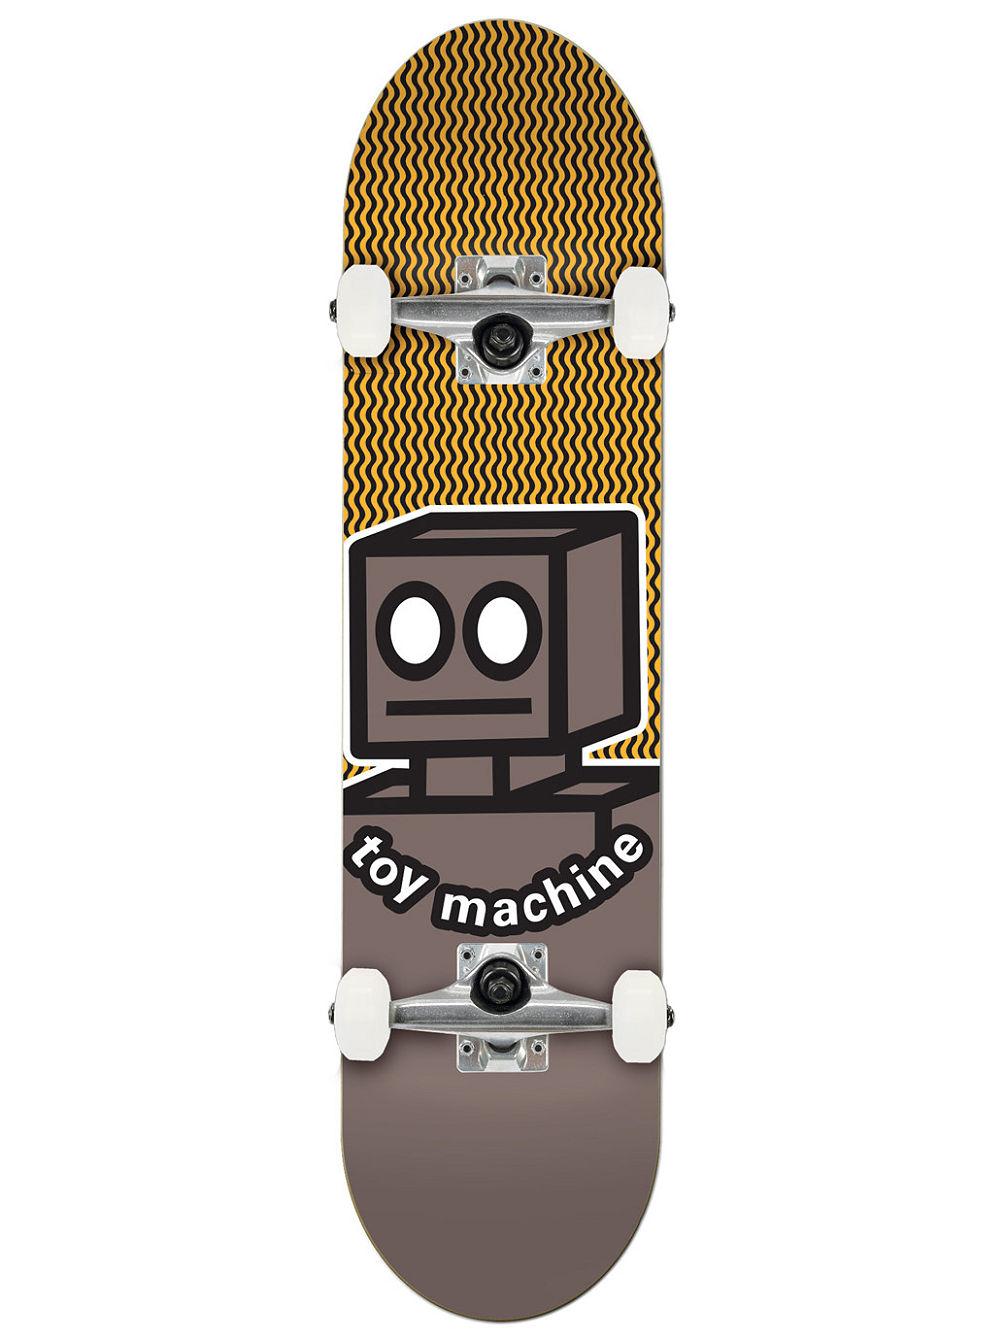 toy-machine-robot-825-complete